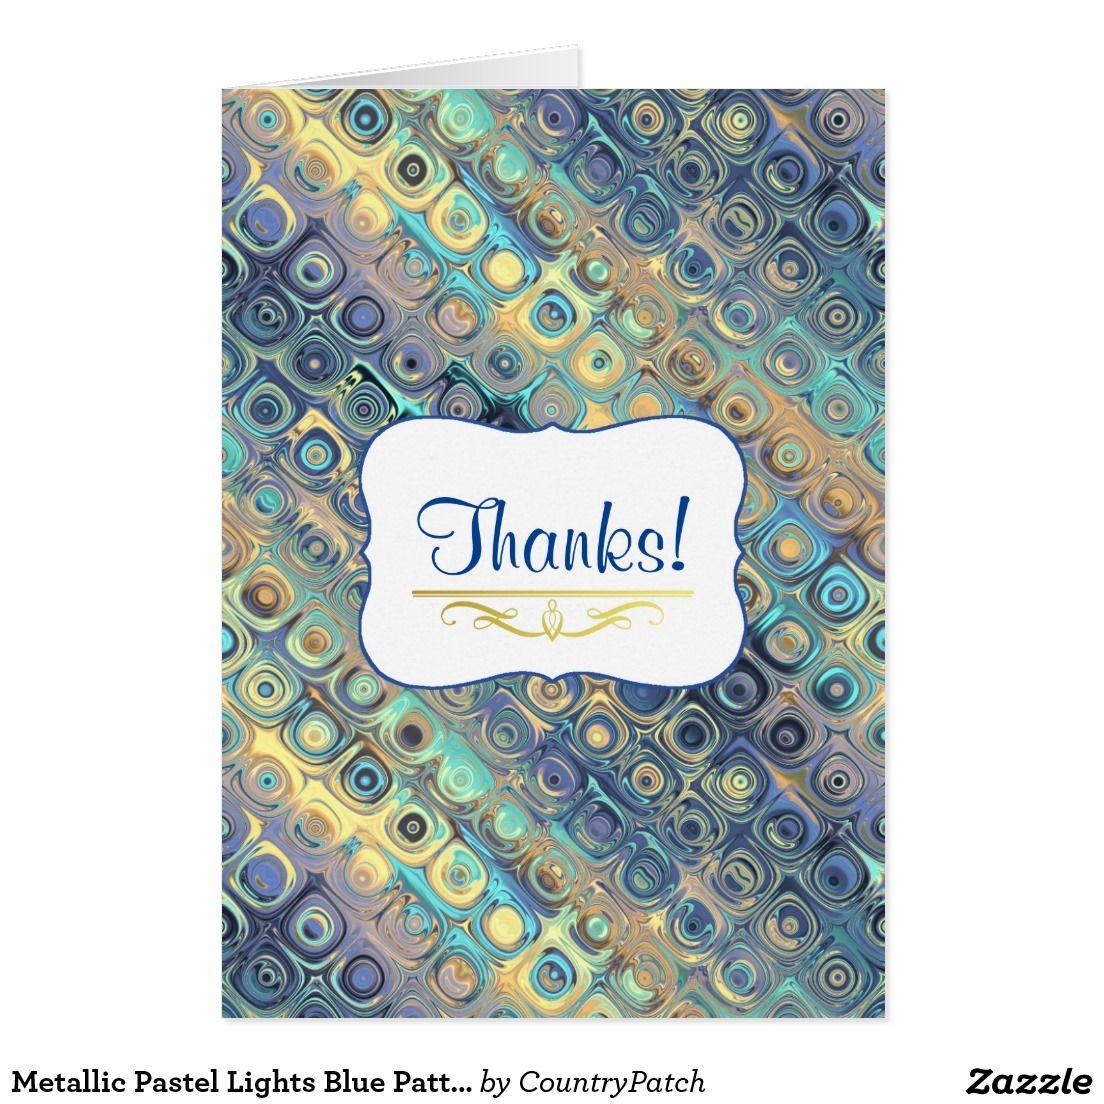 Metallic Pastel Lights Blue Pattern Custom greeting